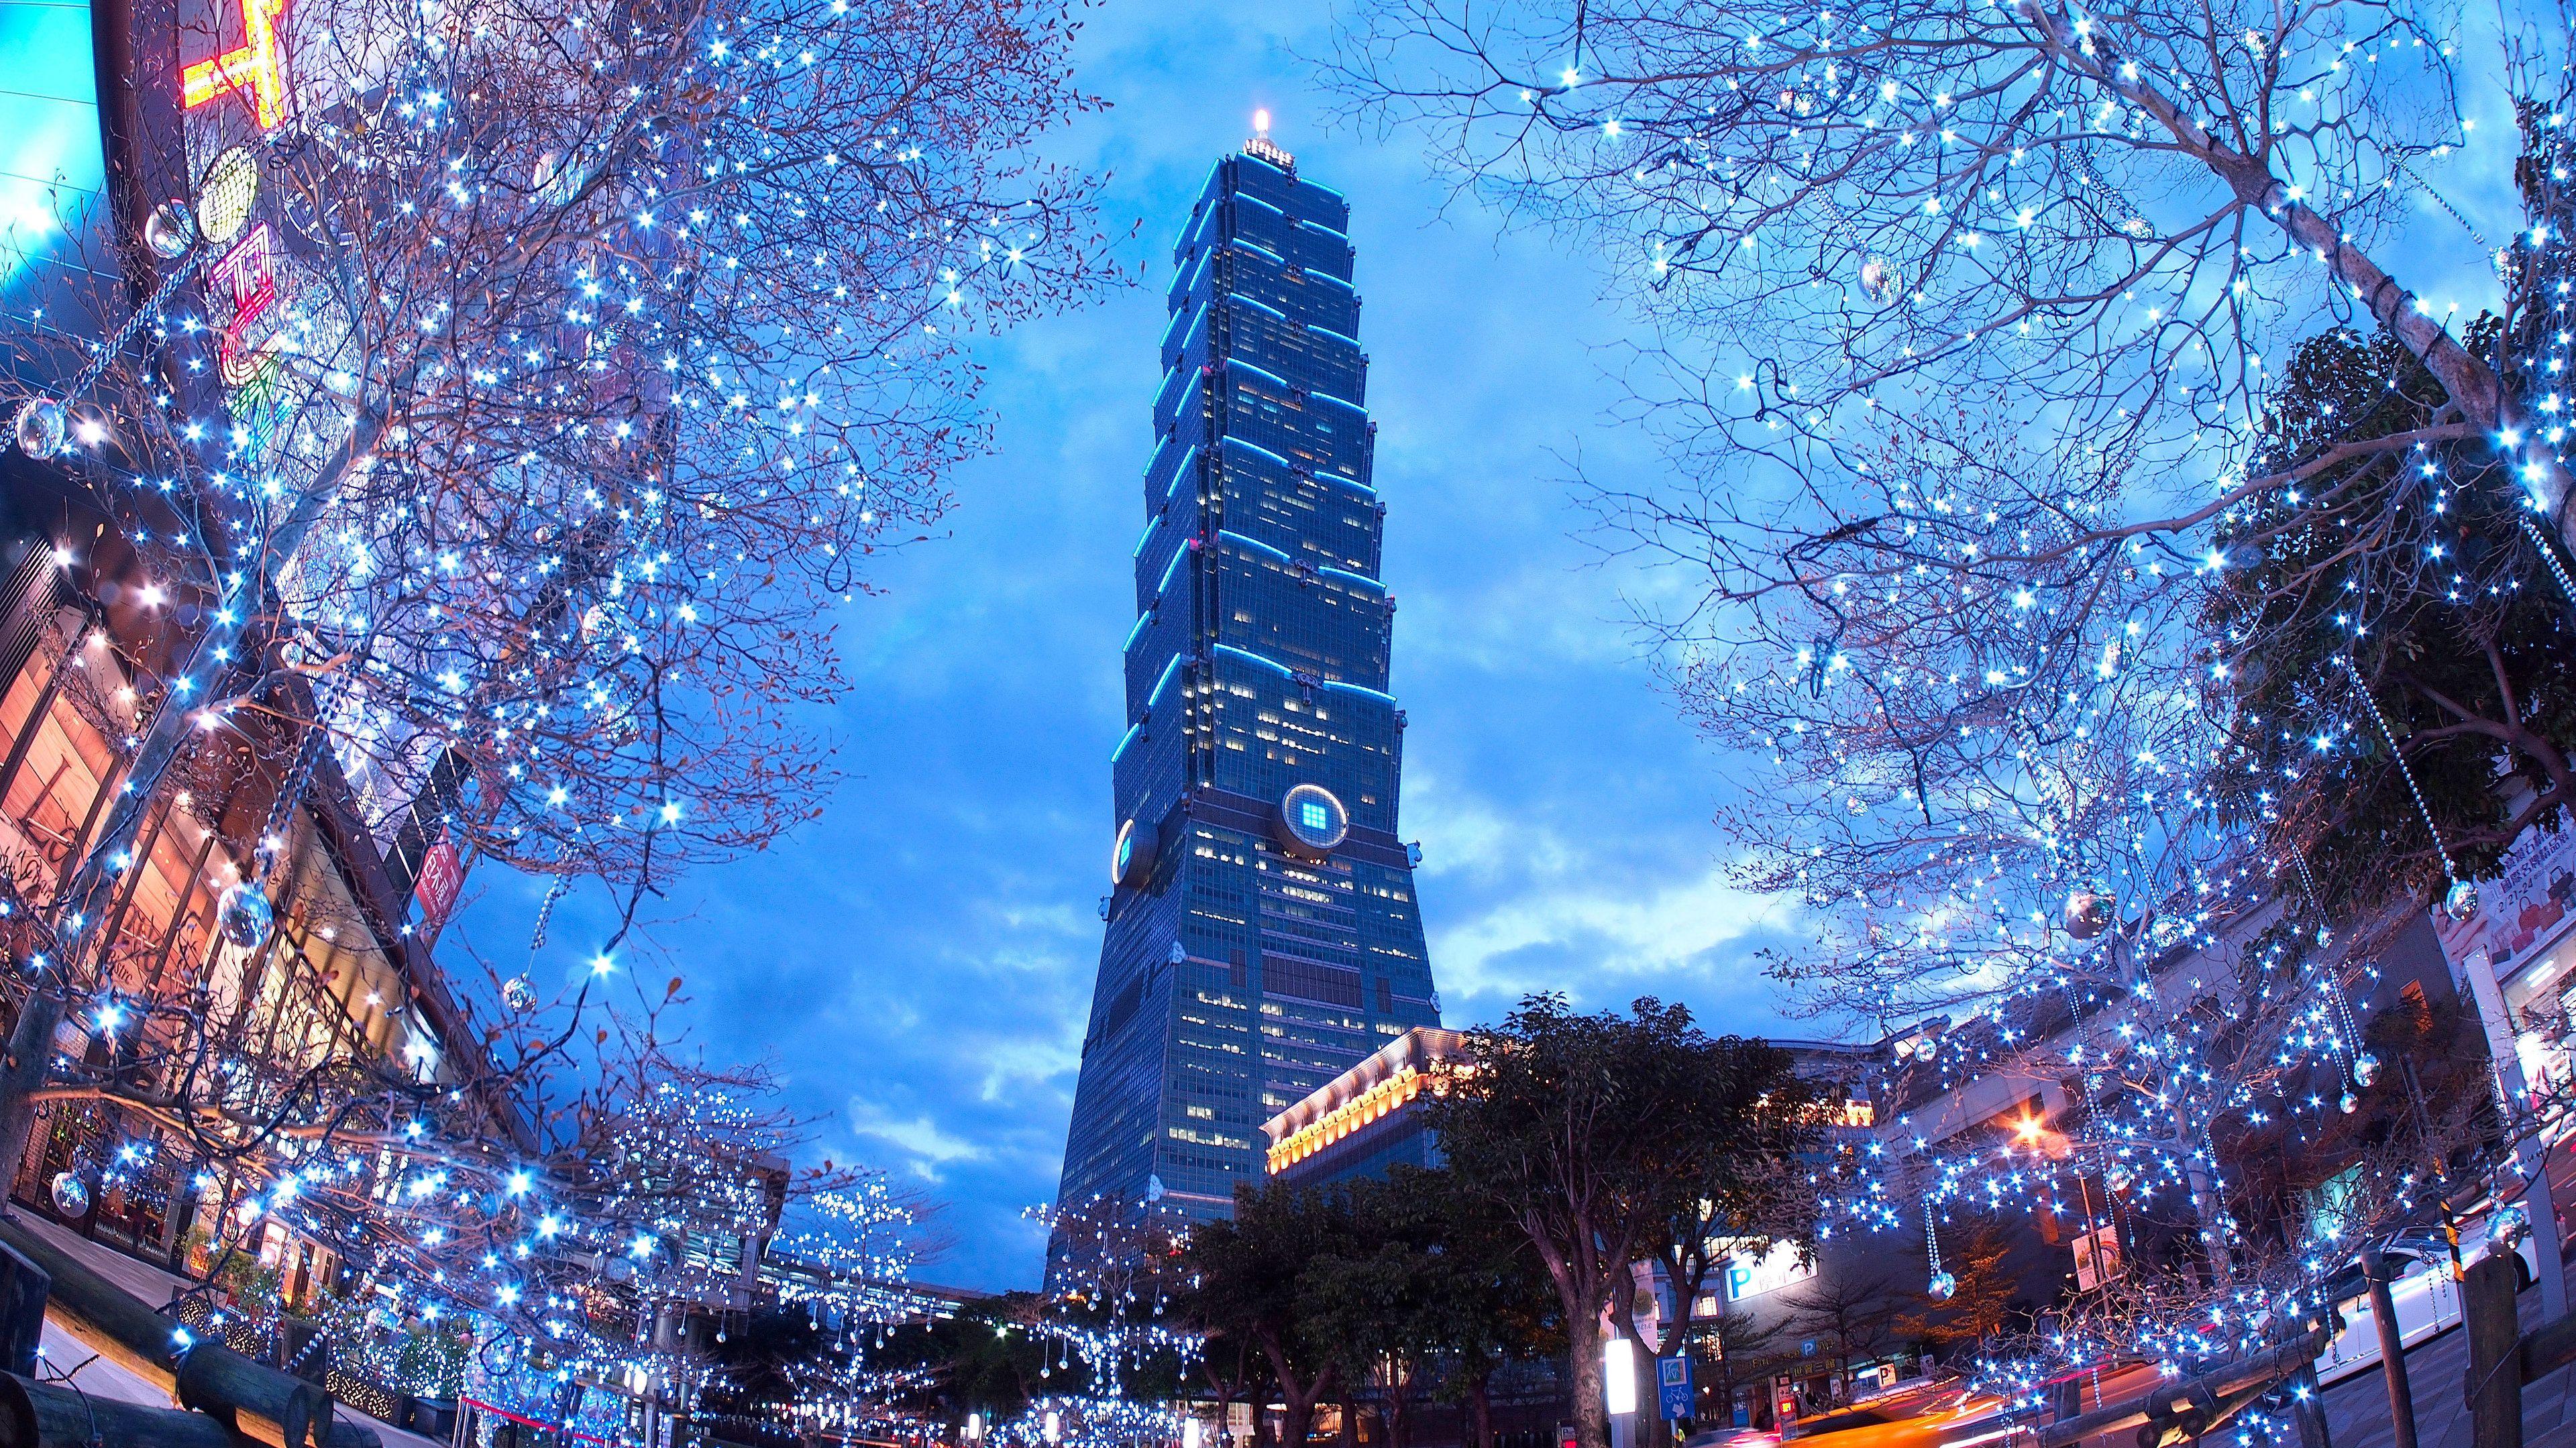 View of Taipei 101 from the ground in Taipei.